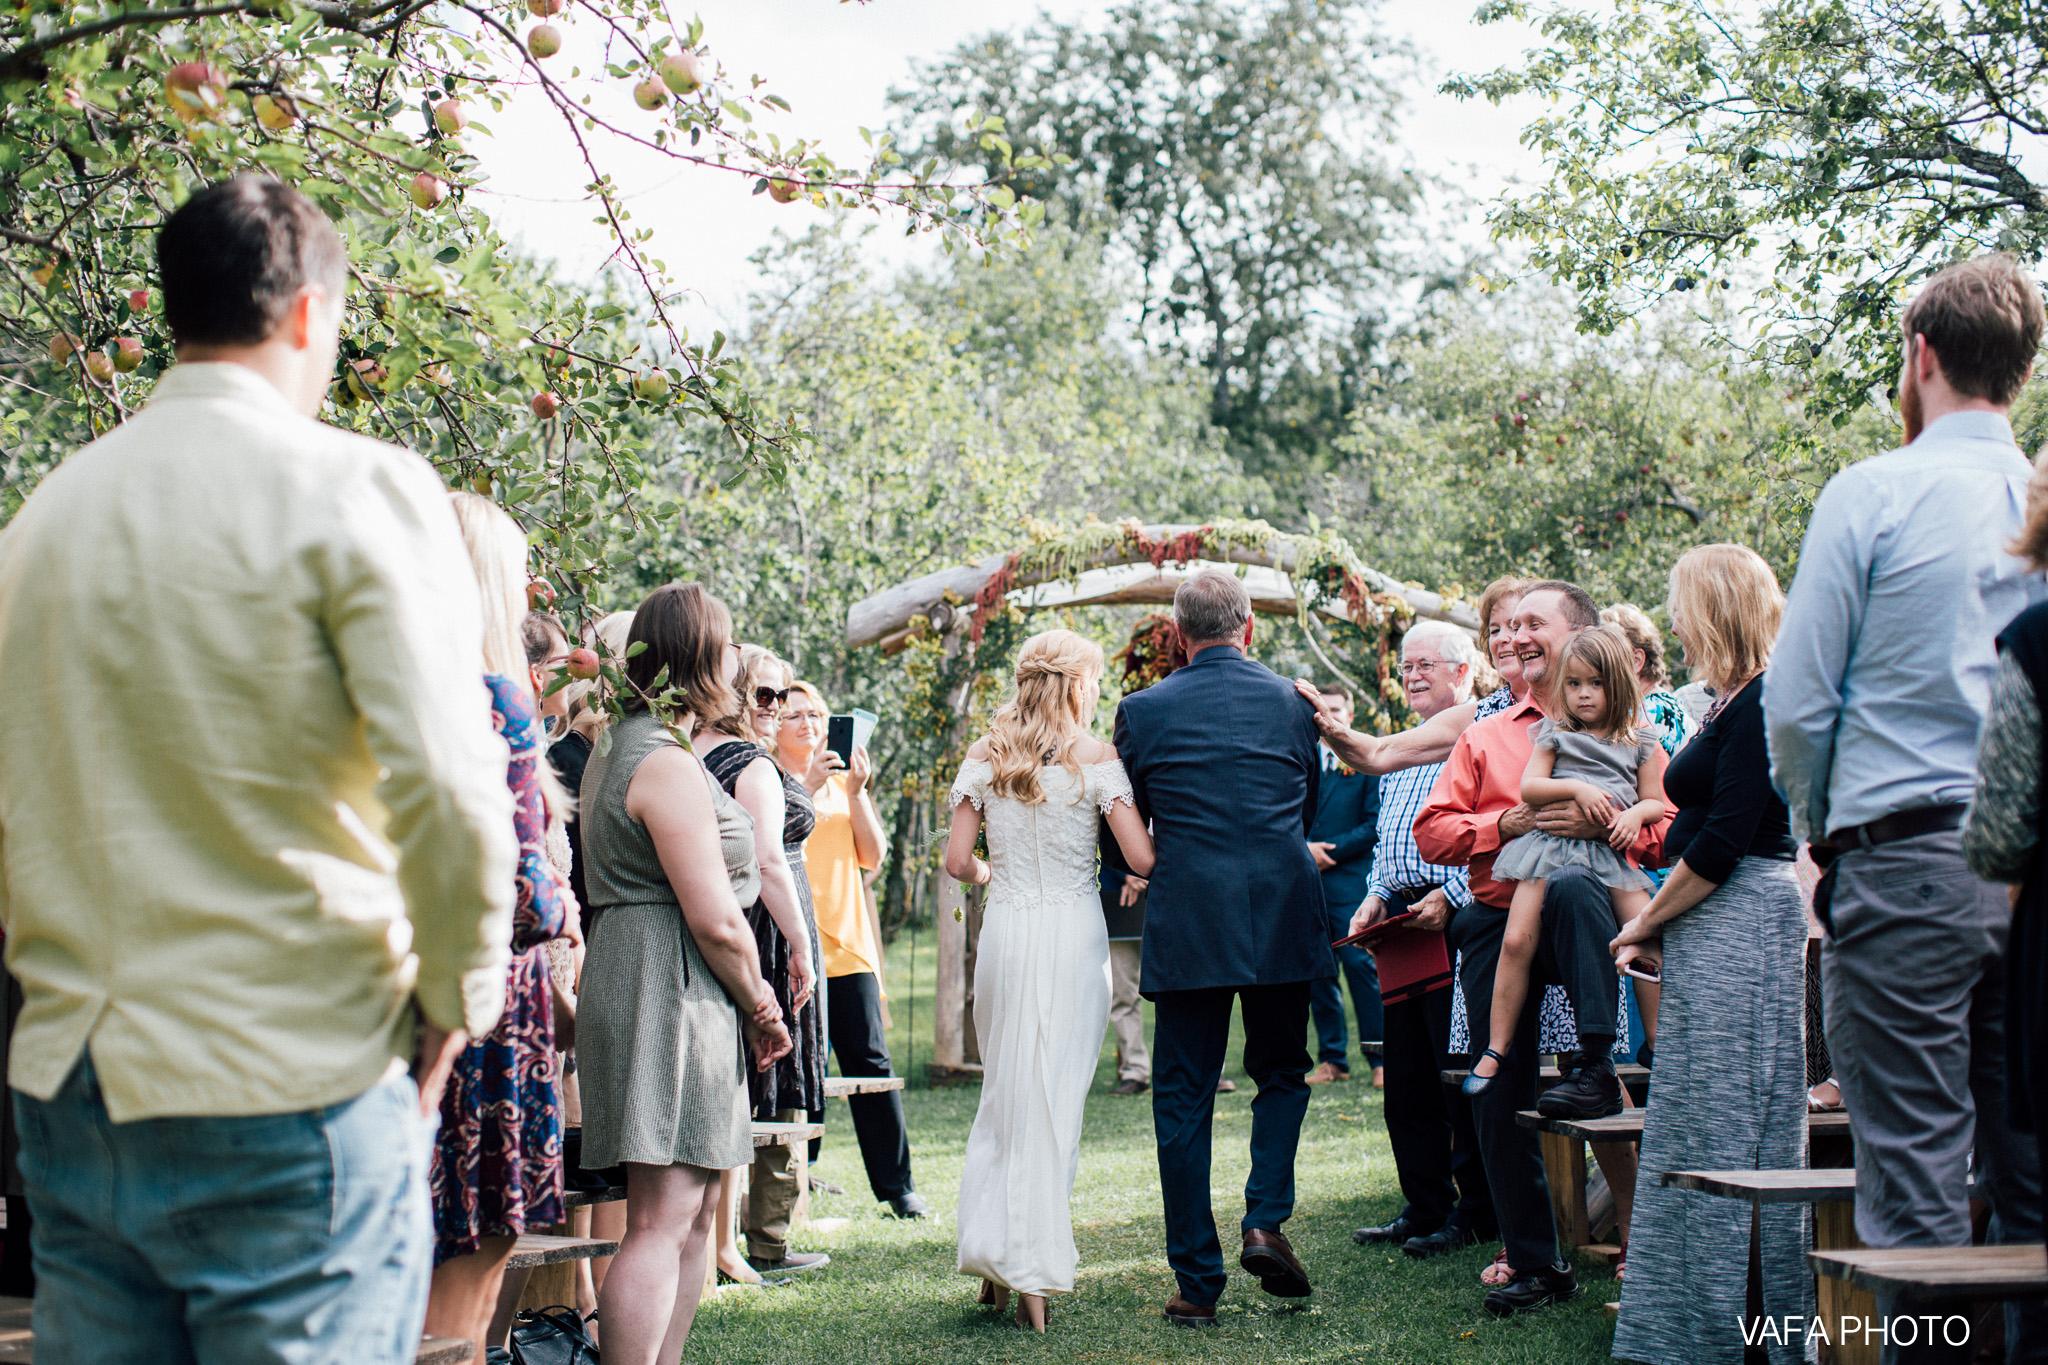 Belsolda-Farm-Wedding-Christy-Eric-Vafa-Photo-410.jpg